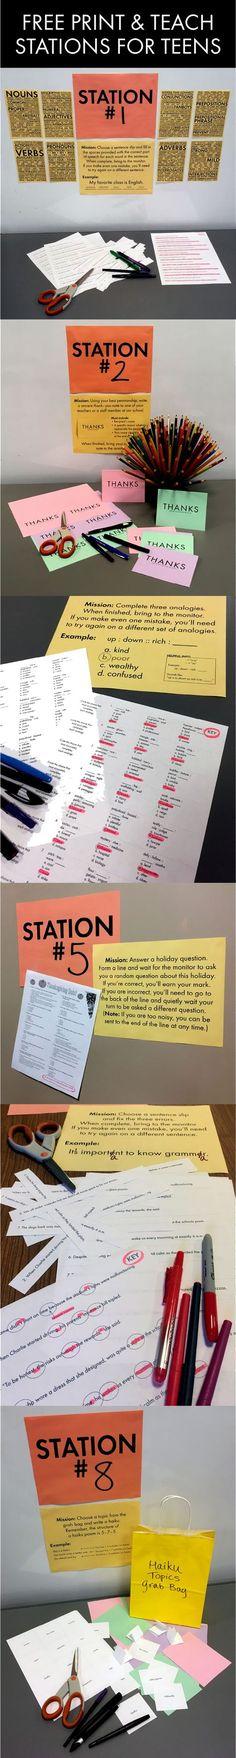 FREE print & teach station materials for middle school and high school teachers #stations #lessonidea #highschool #middleschool #Englishteacher